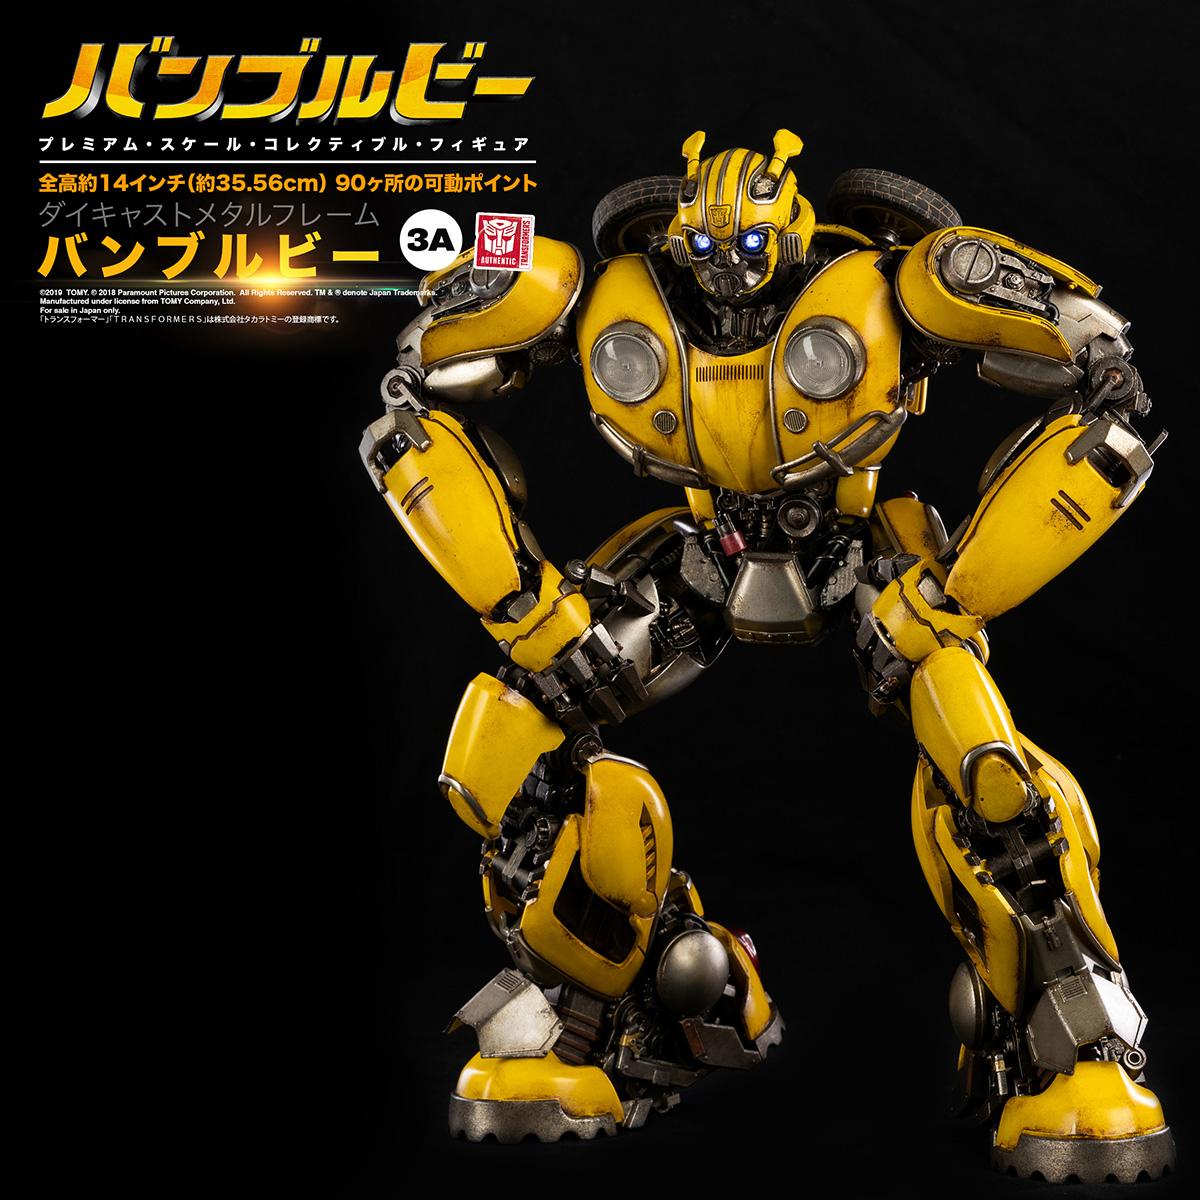 Bumblebee_JAP_PM_00097.jpg